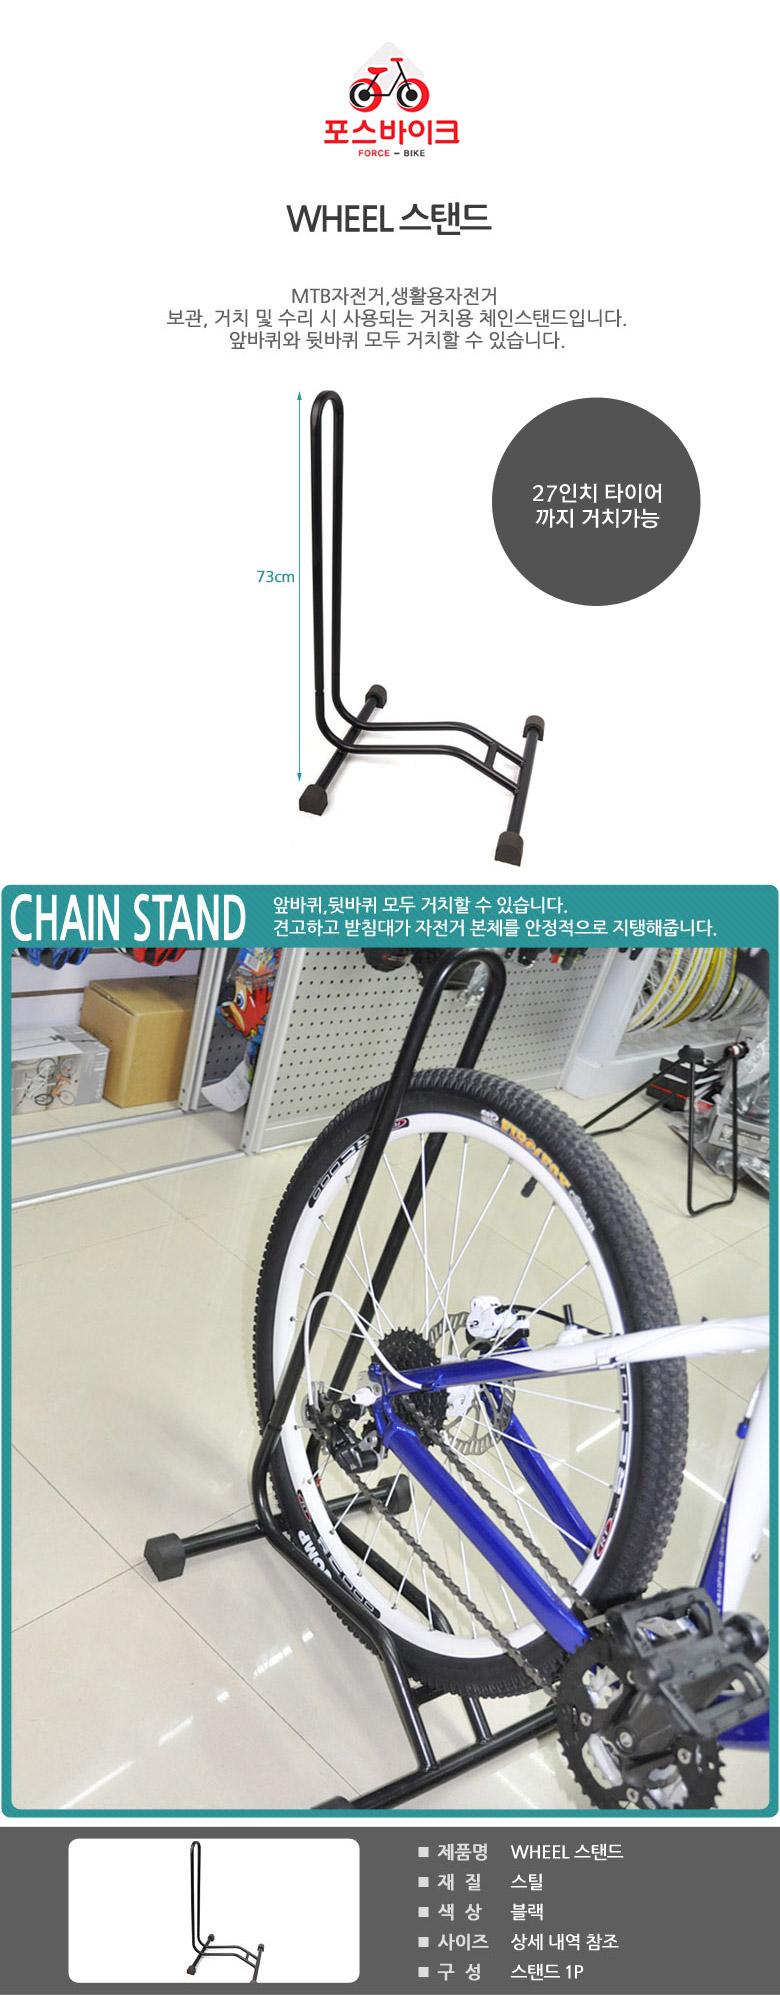 WHEEL스탠드 자전거용품 스탠드 자전거받침대 - 포스트레이딩, 8,400원, 자전거 악세서리, 거치대/스탠드